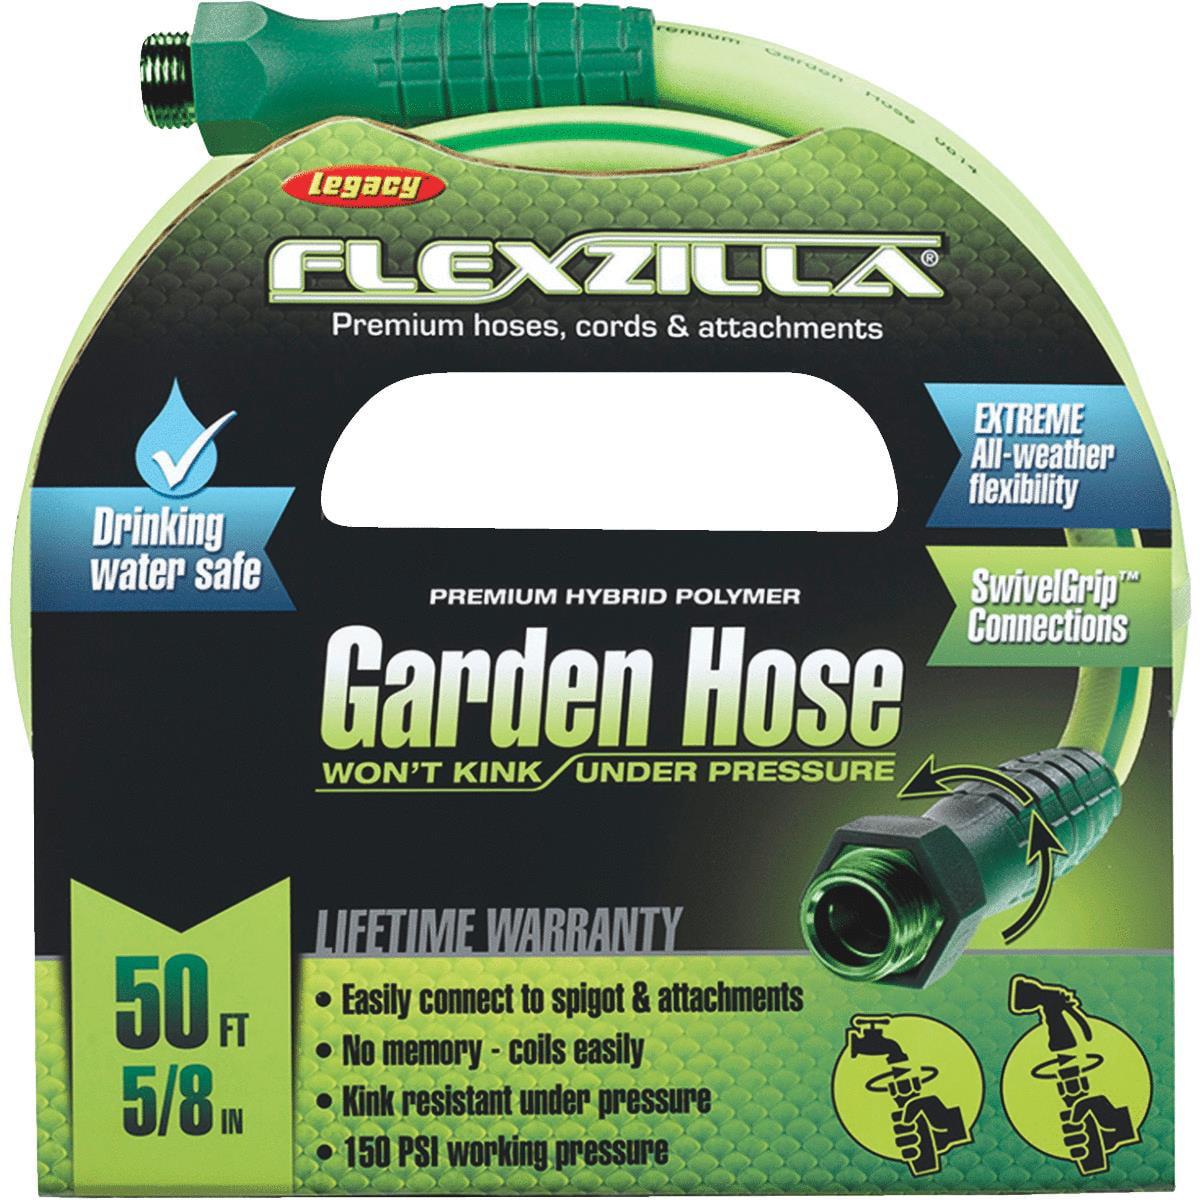 Flexzilla Garden Hose With SwivelGrip Connections by Legacy Flexilla GS